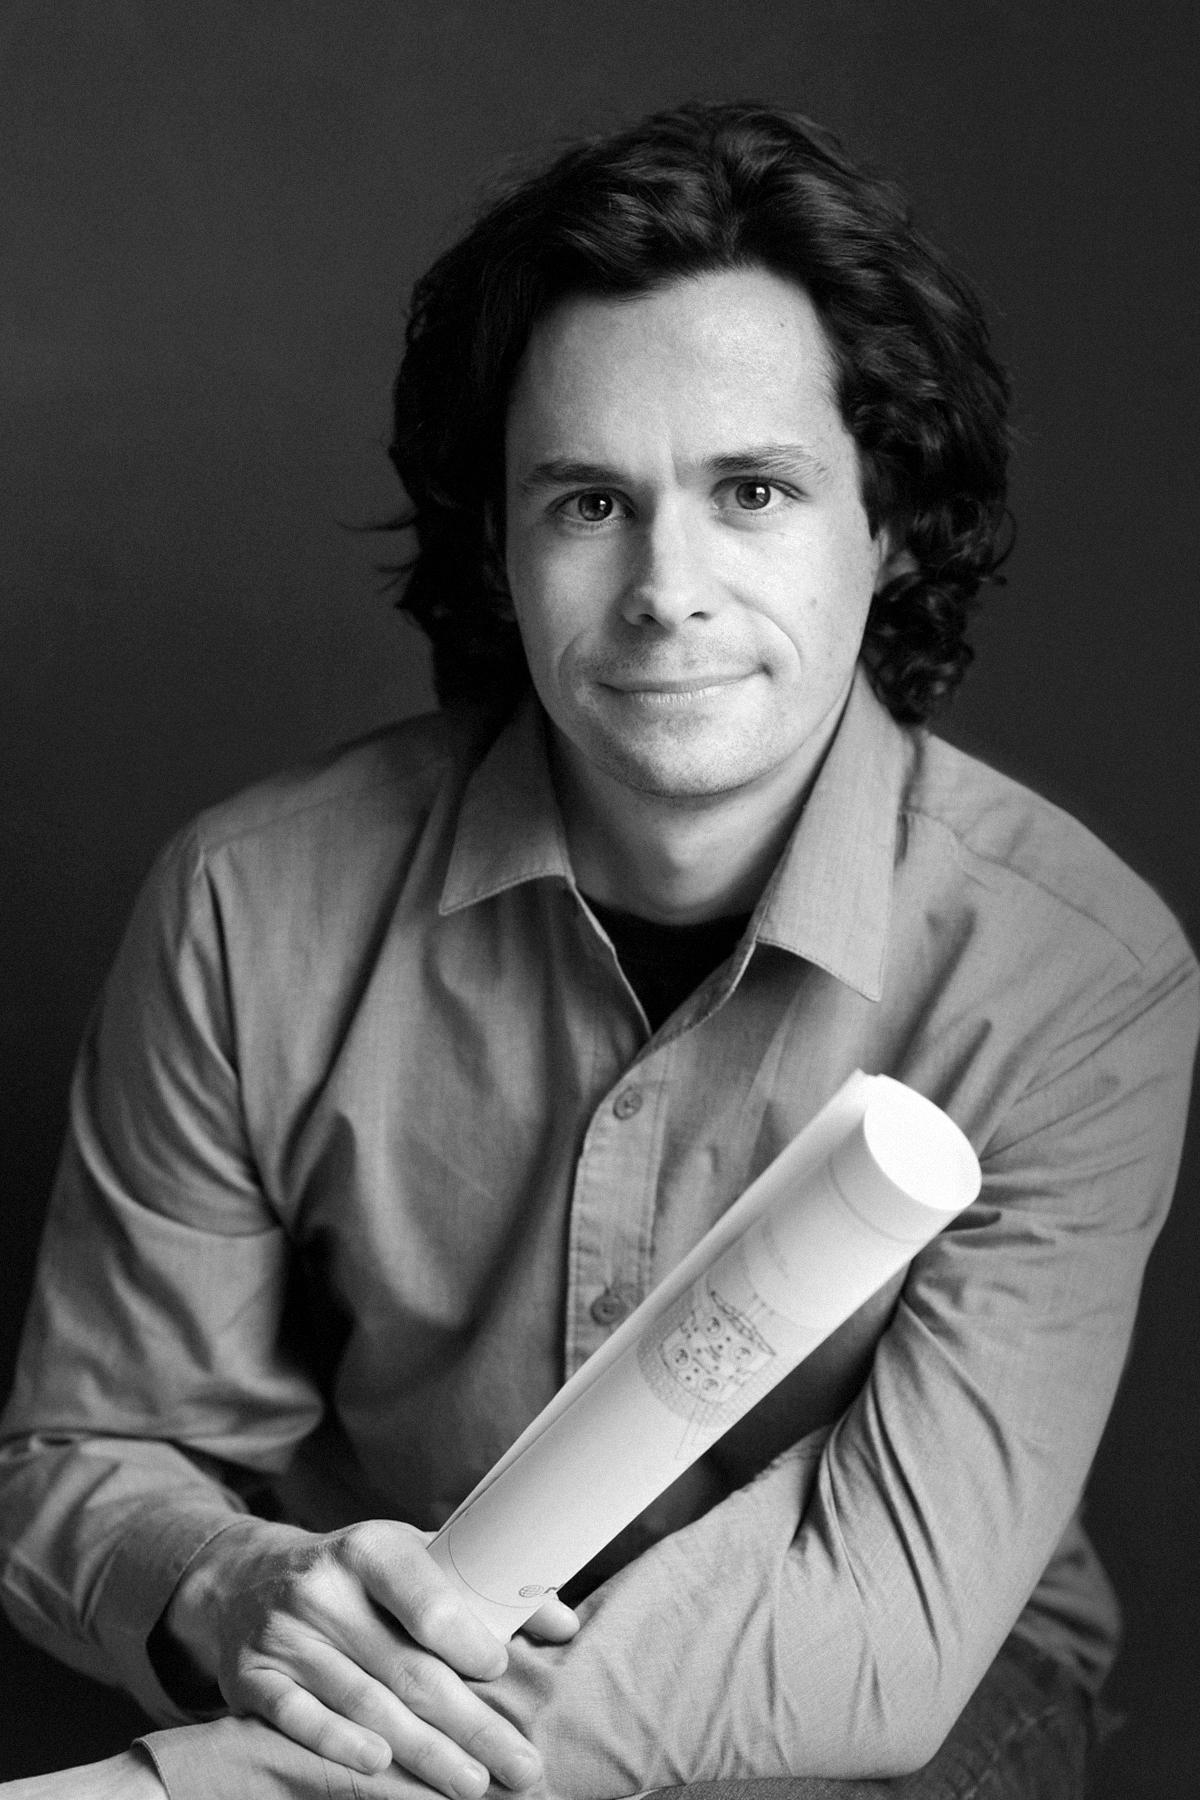 Alan Tufts, Landscape Architect